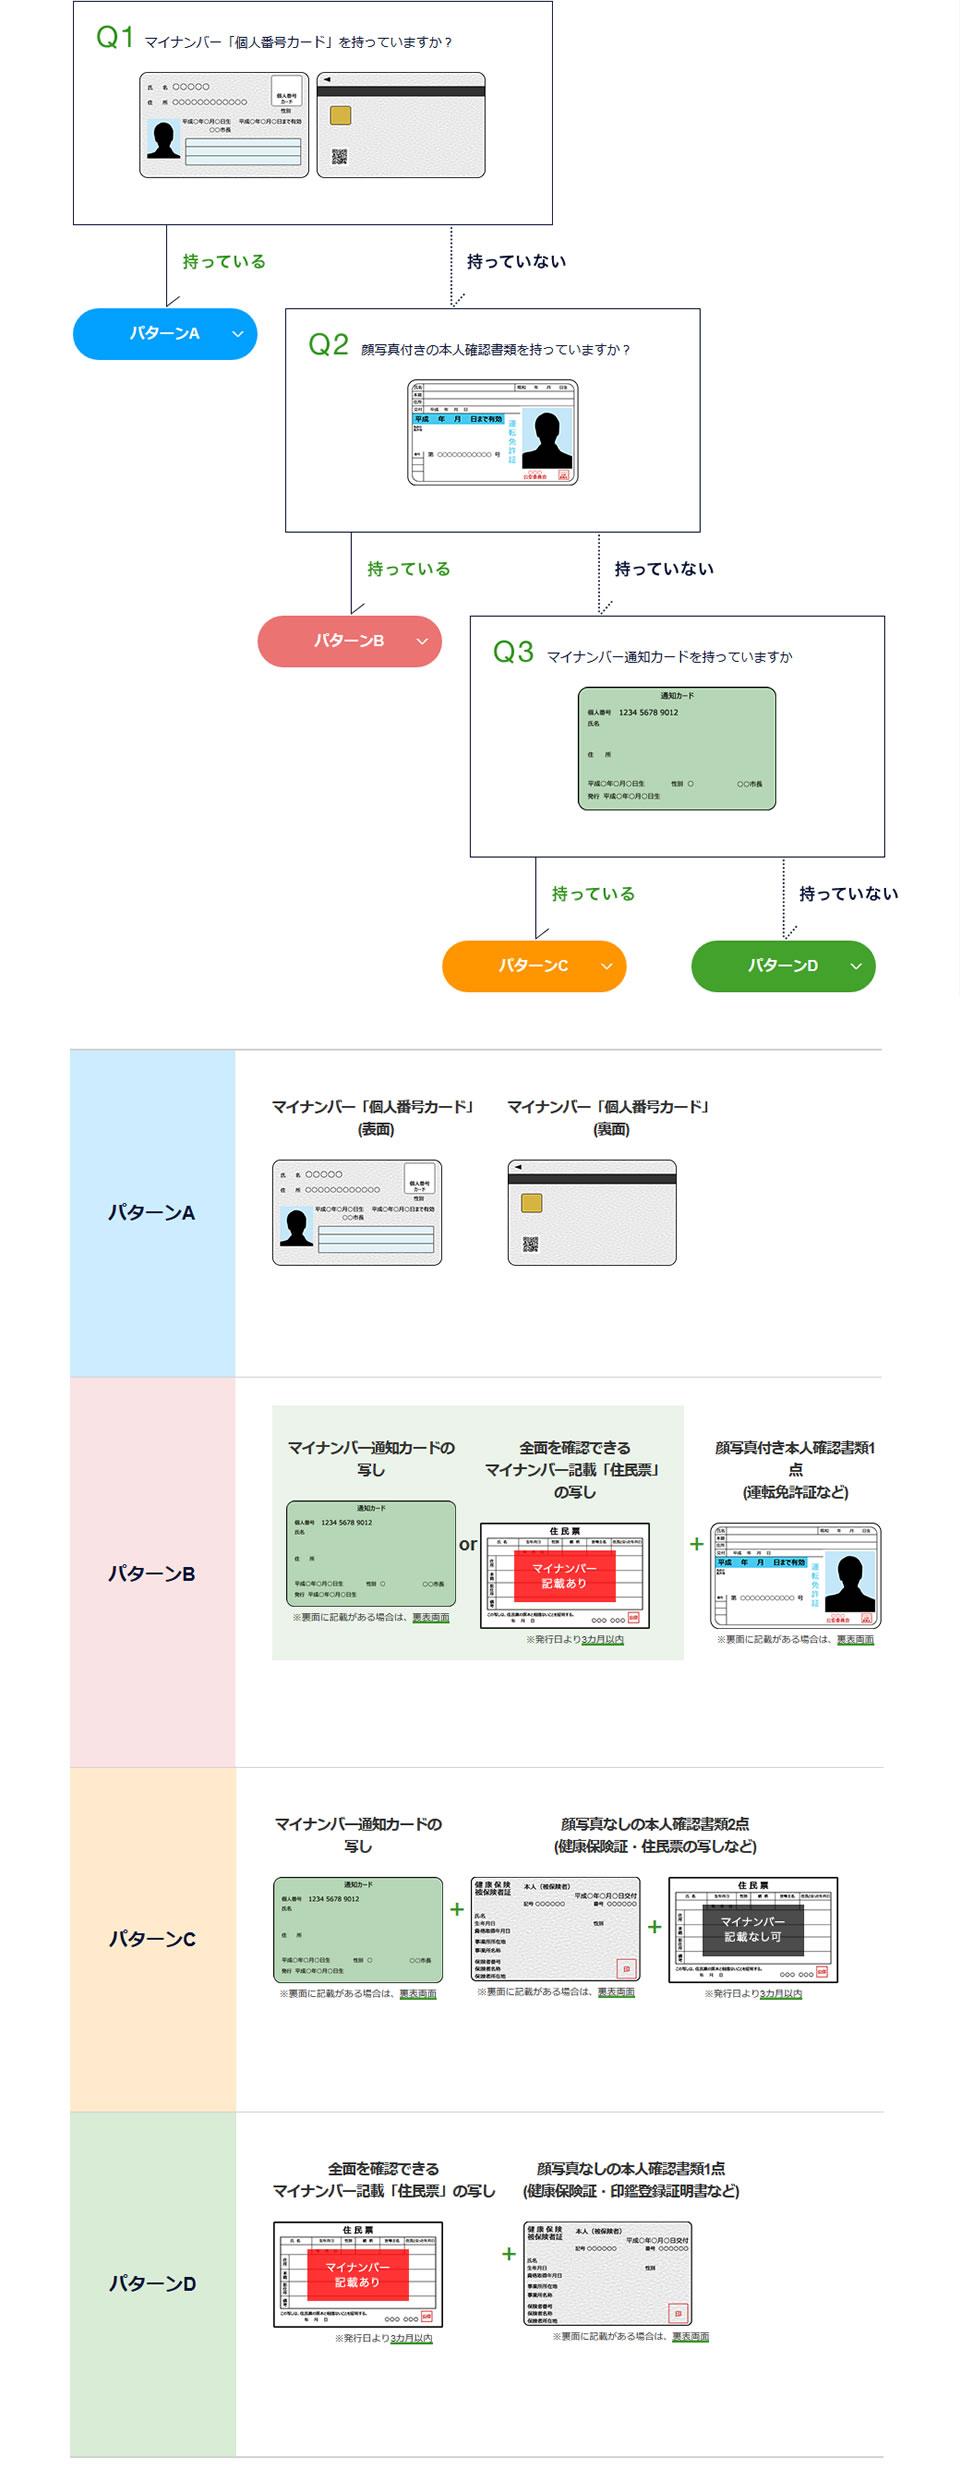 DMM FX 口座開設方法 必要書類など詳しく解説